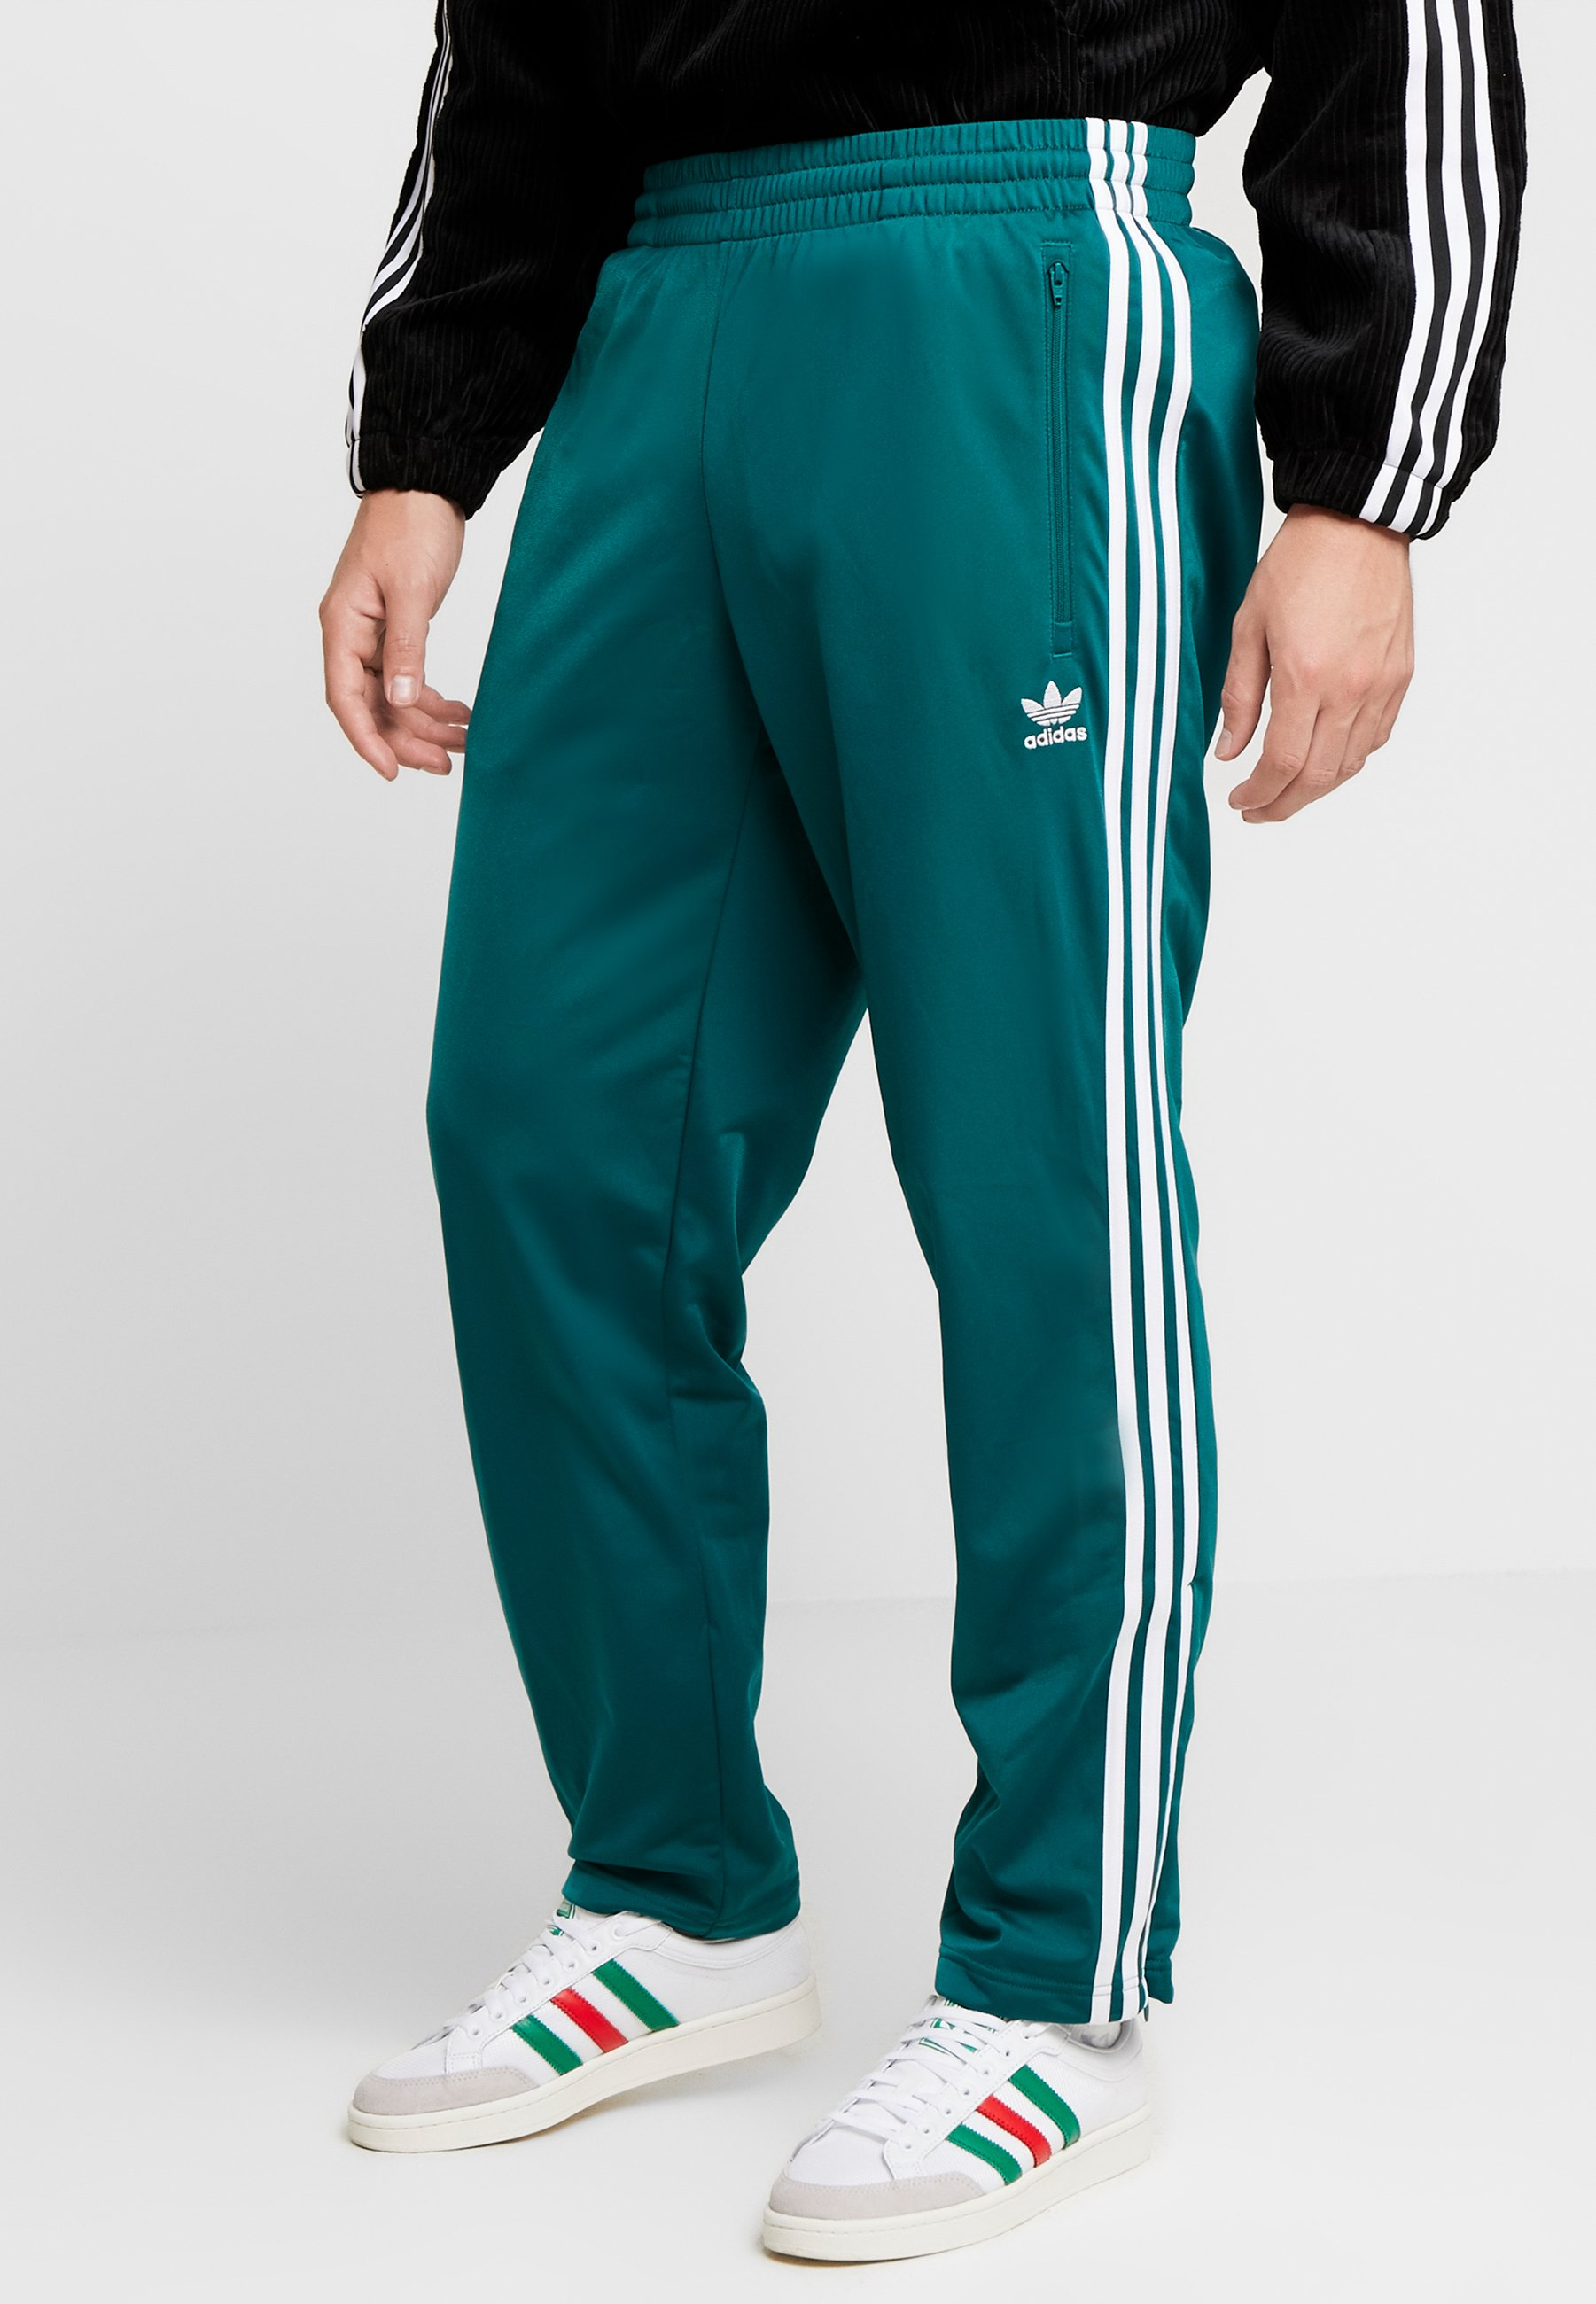 FIREBIRD ADICOLOR TRACK PANTS - Trainingsbroek - noble green